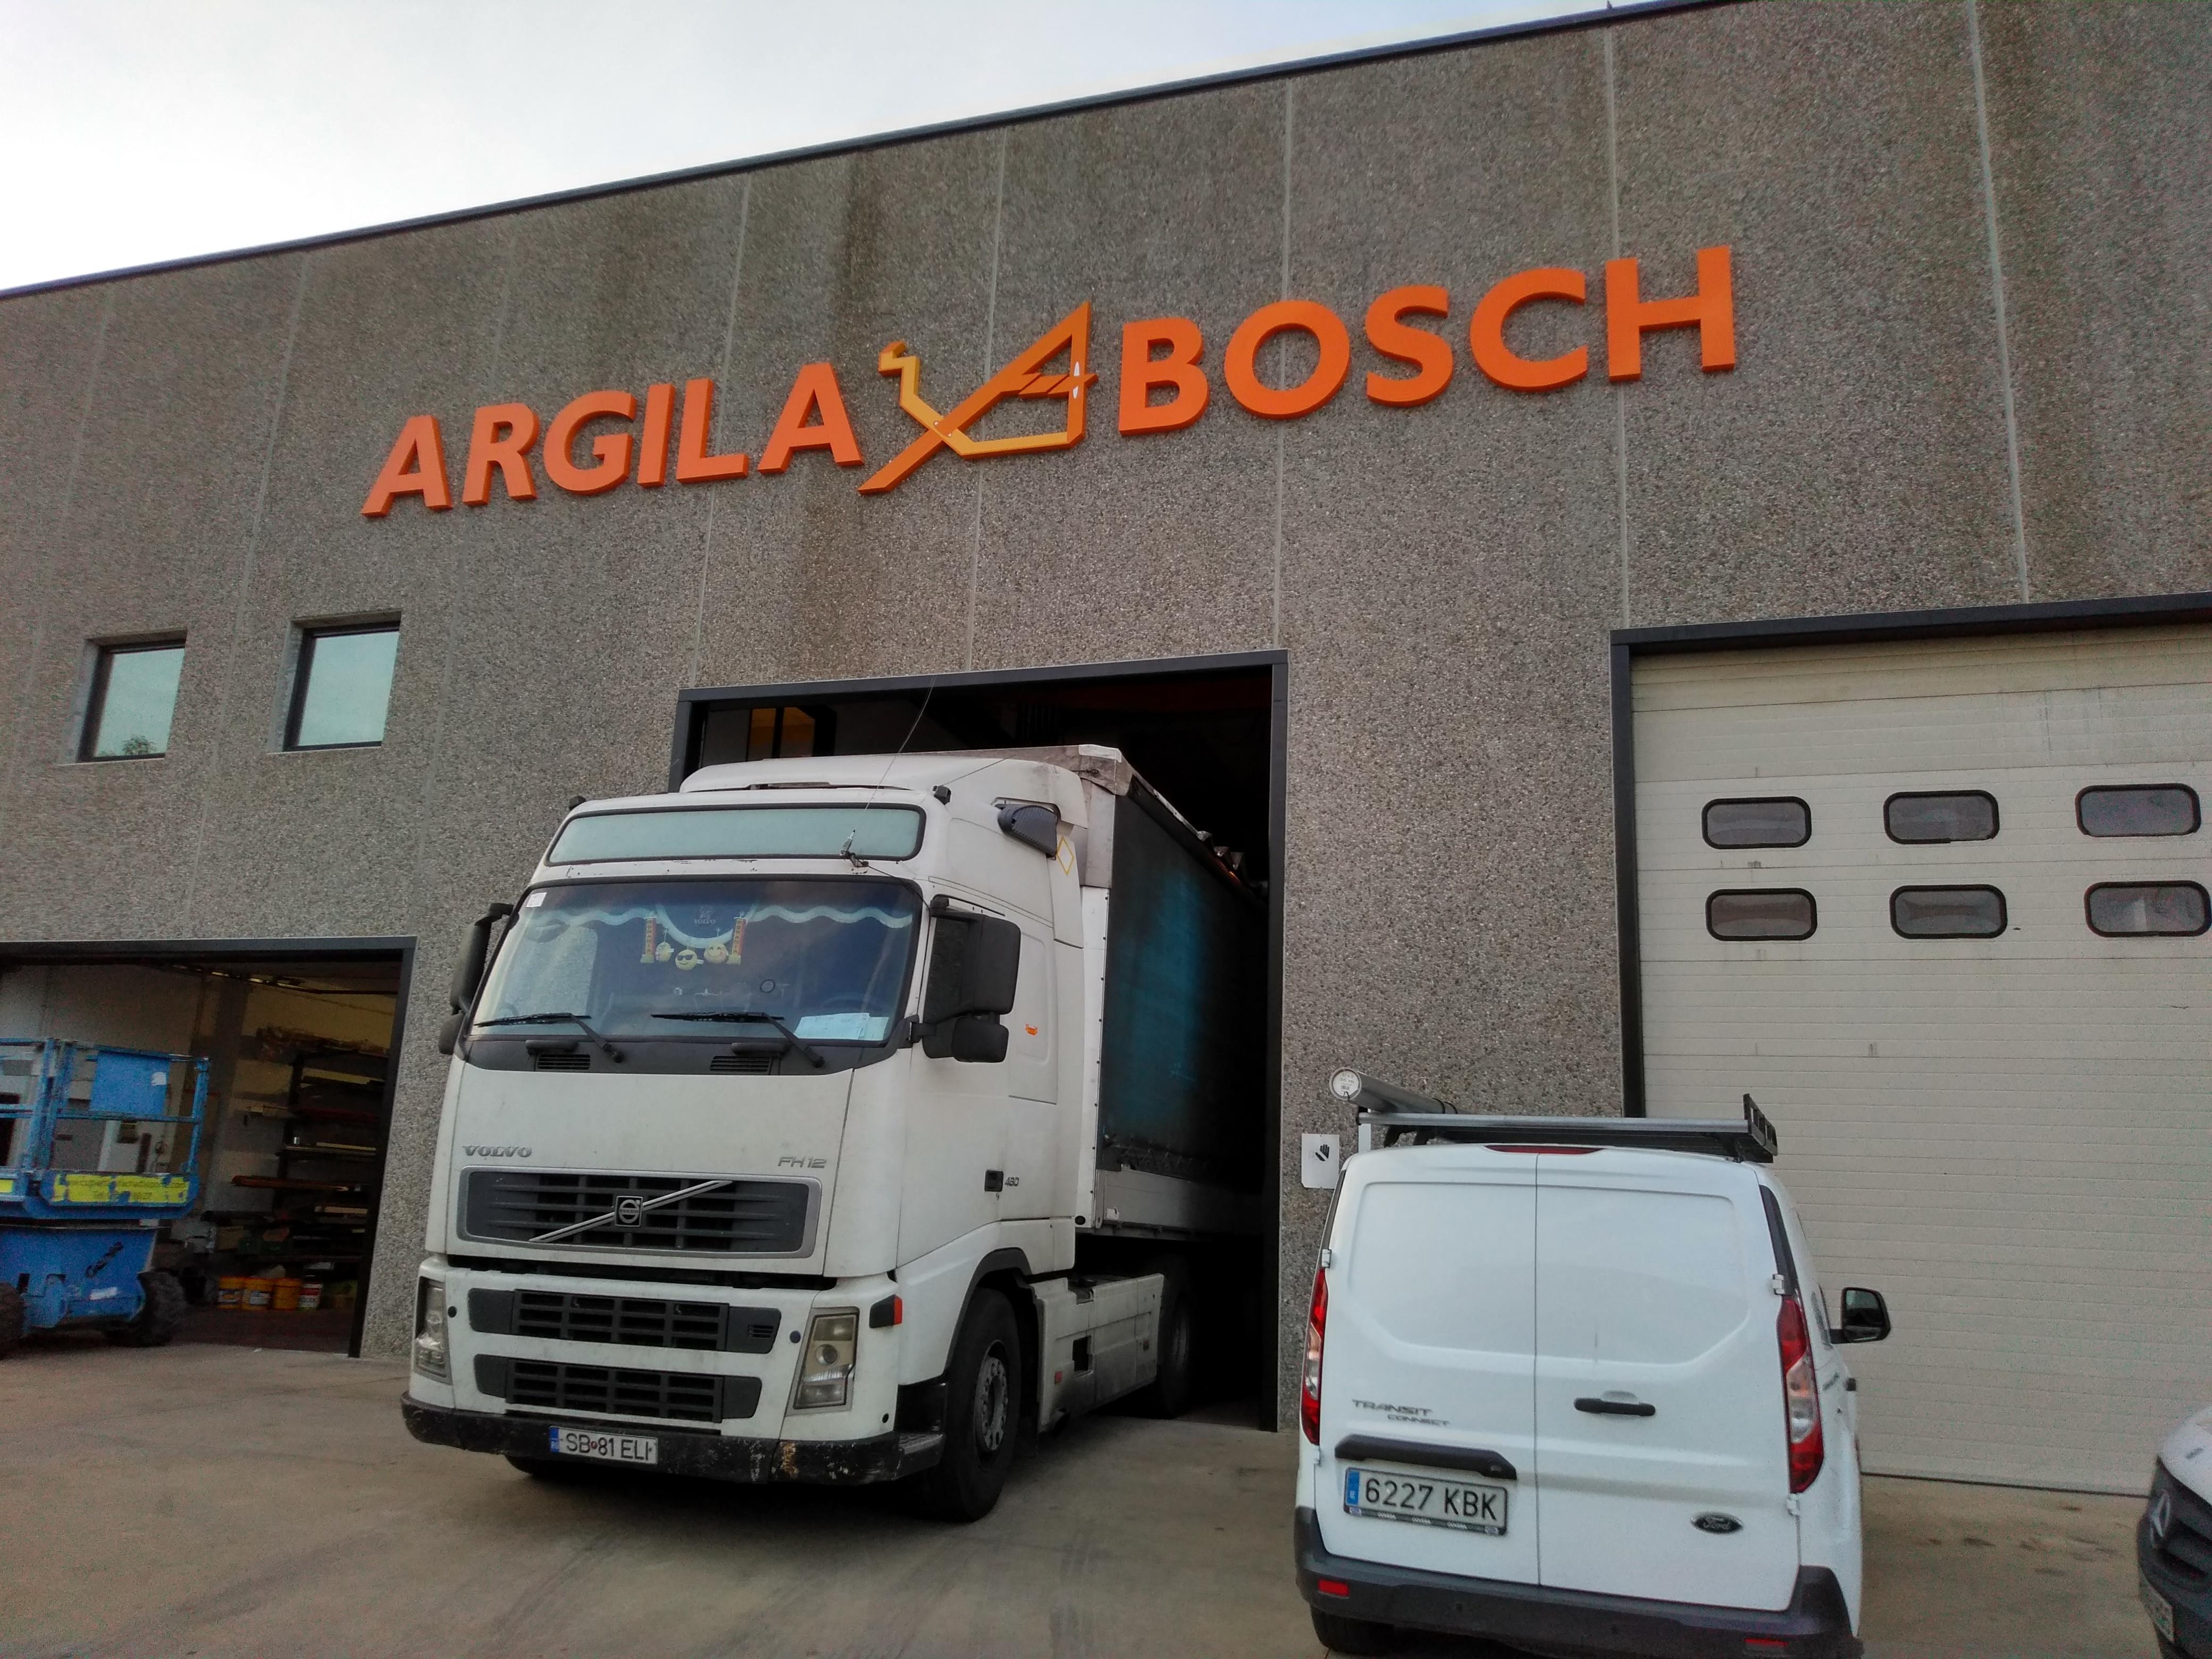 Argila Bosch